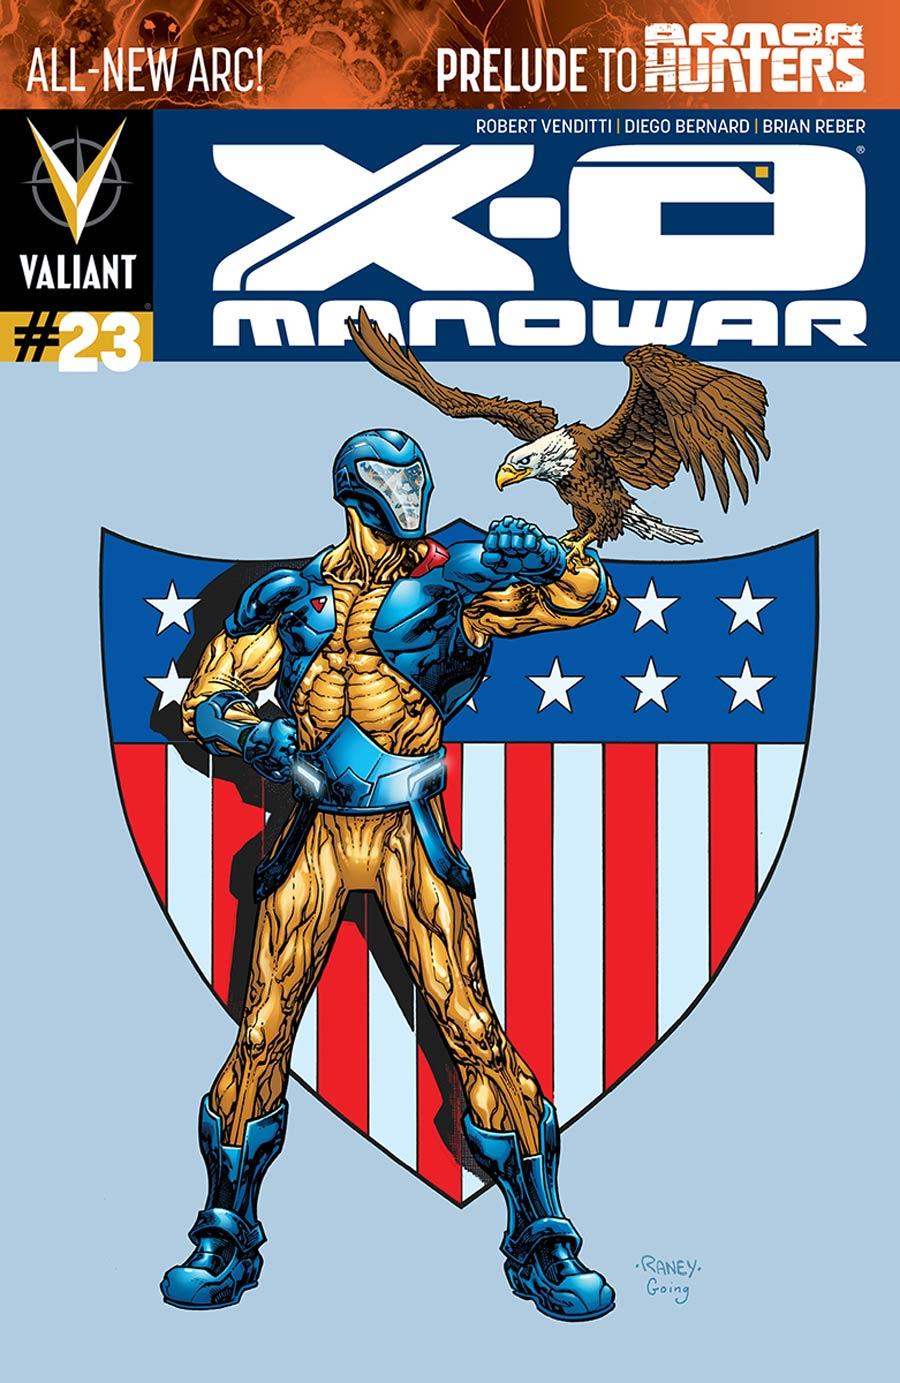 X-O Manowar Vol 3 #23 Cover B Variant Tom Raney Cover (Armor Hunters Prelude)